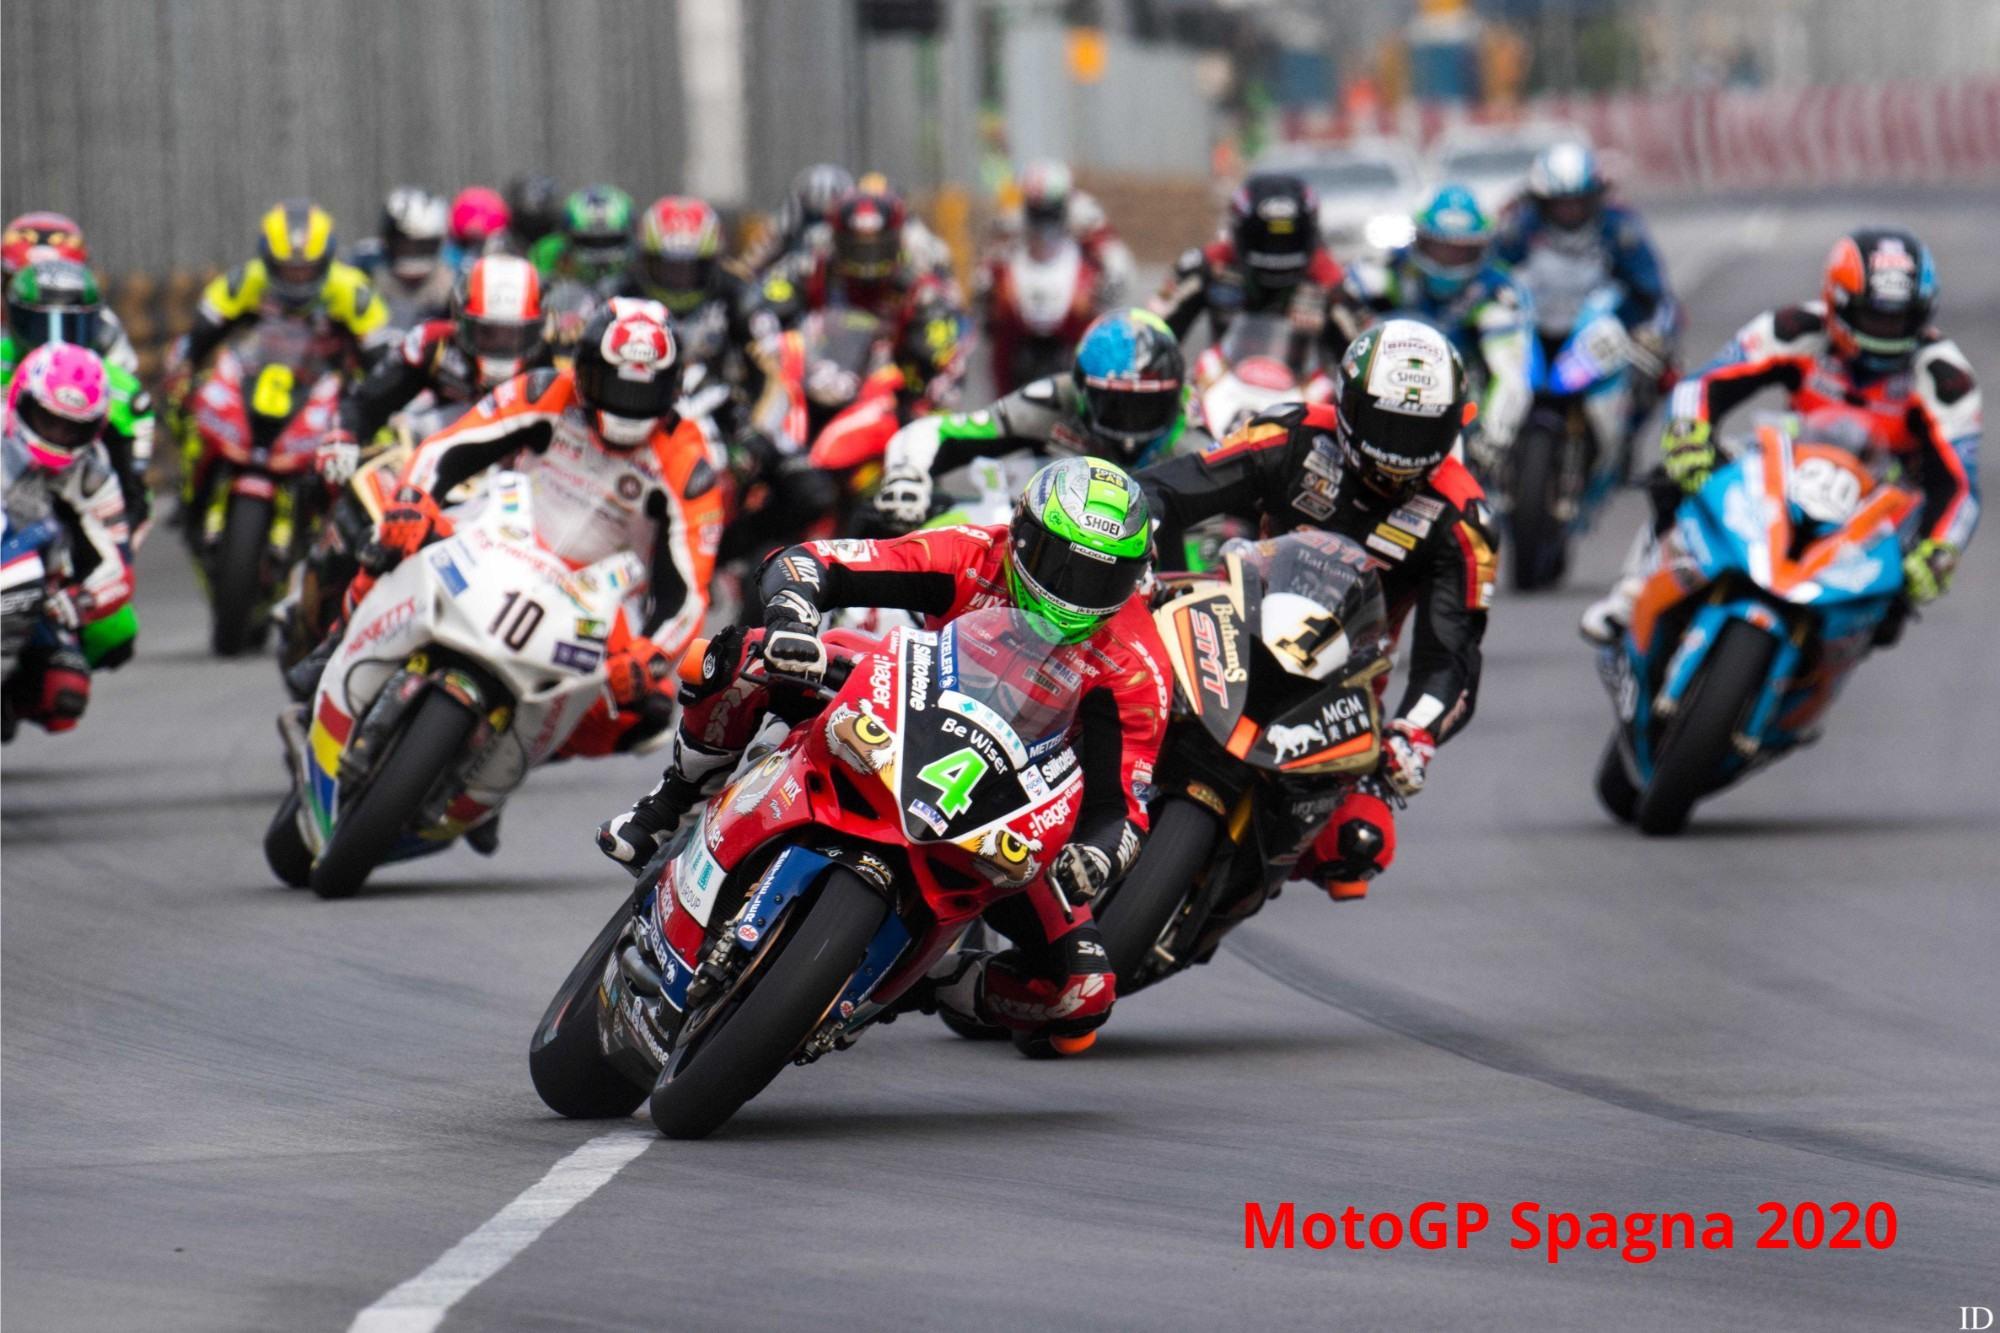 MotoGP Spagna 2020